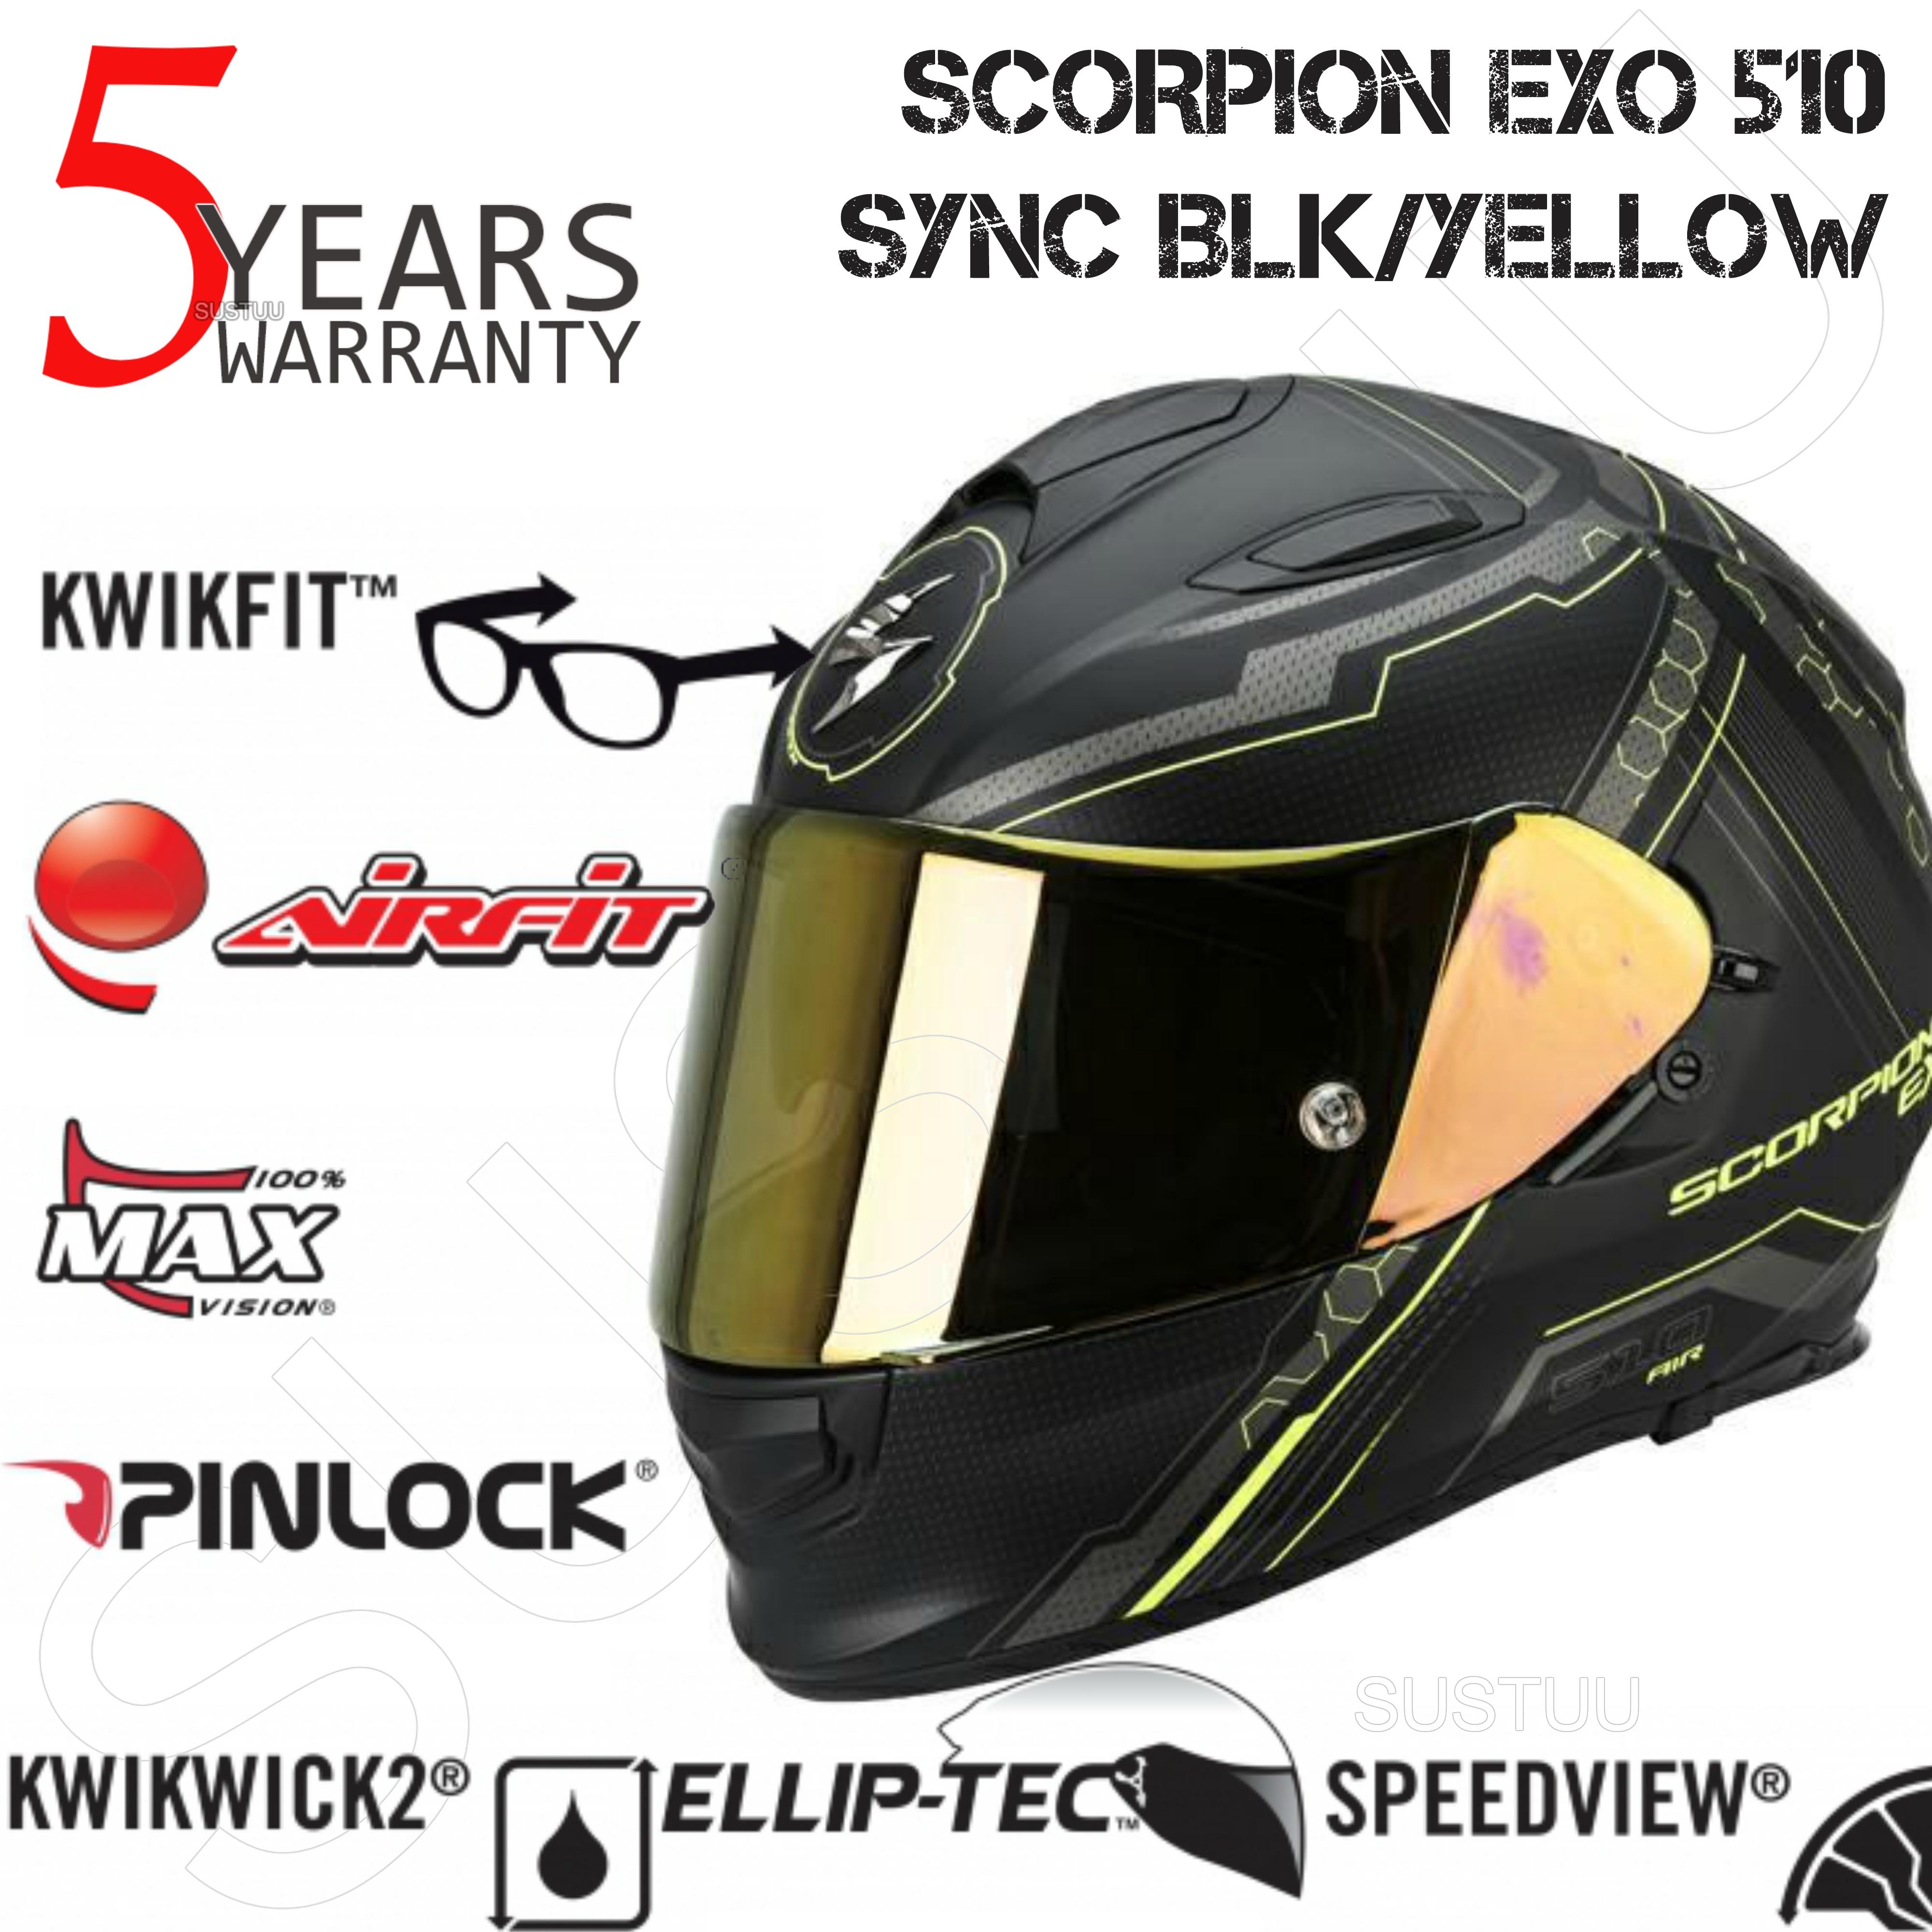 Scorpion Exo 510 Black & Yellow Bike Helmet Full Face Air Sync TUV Tested Unisex